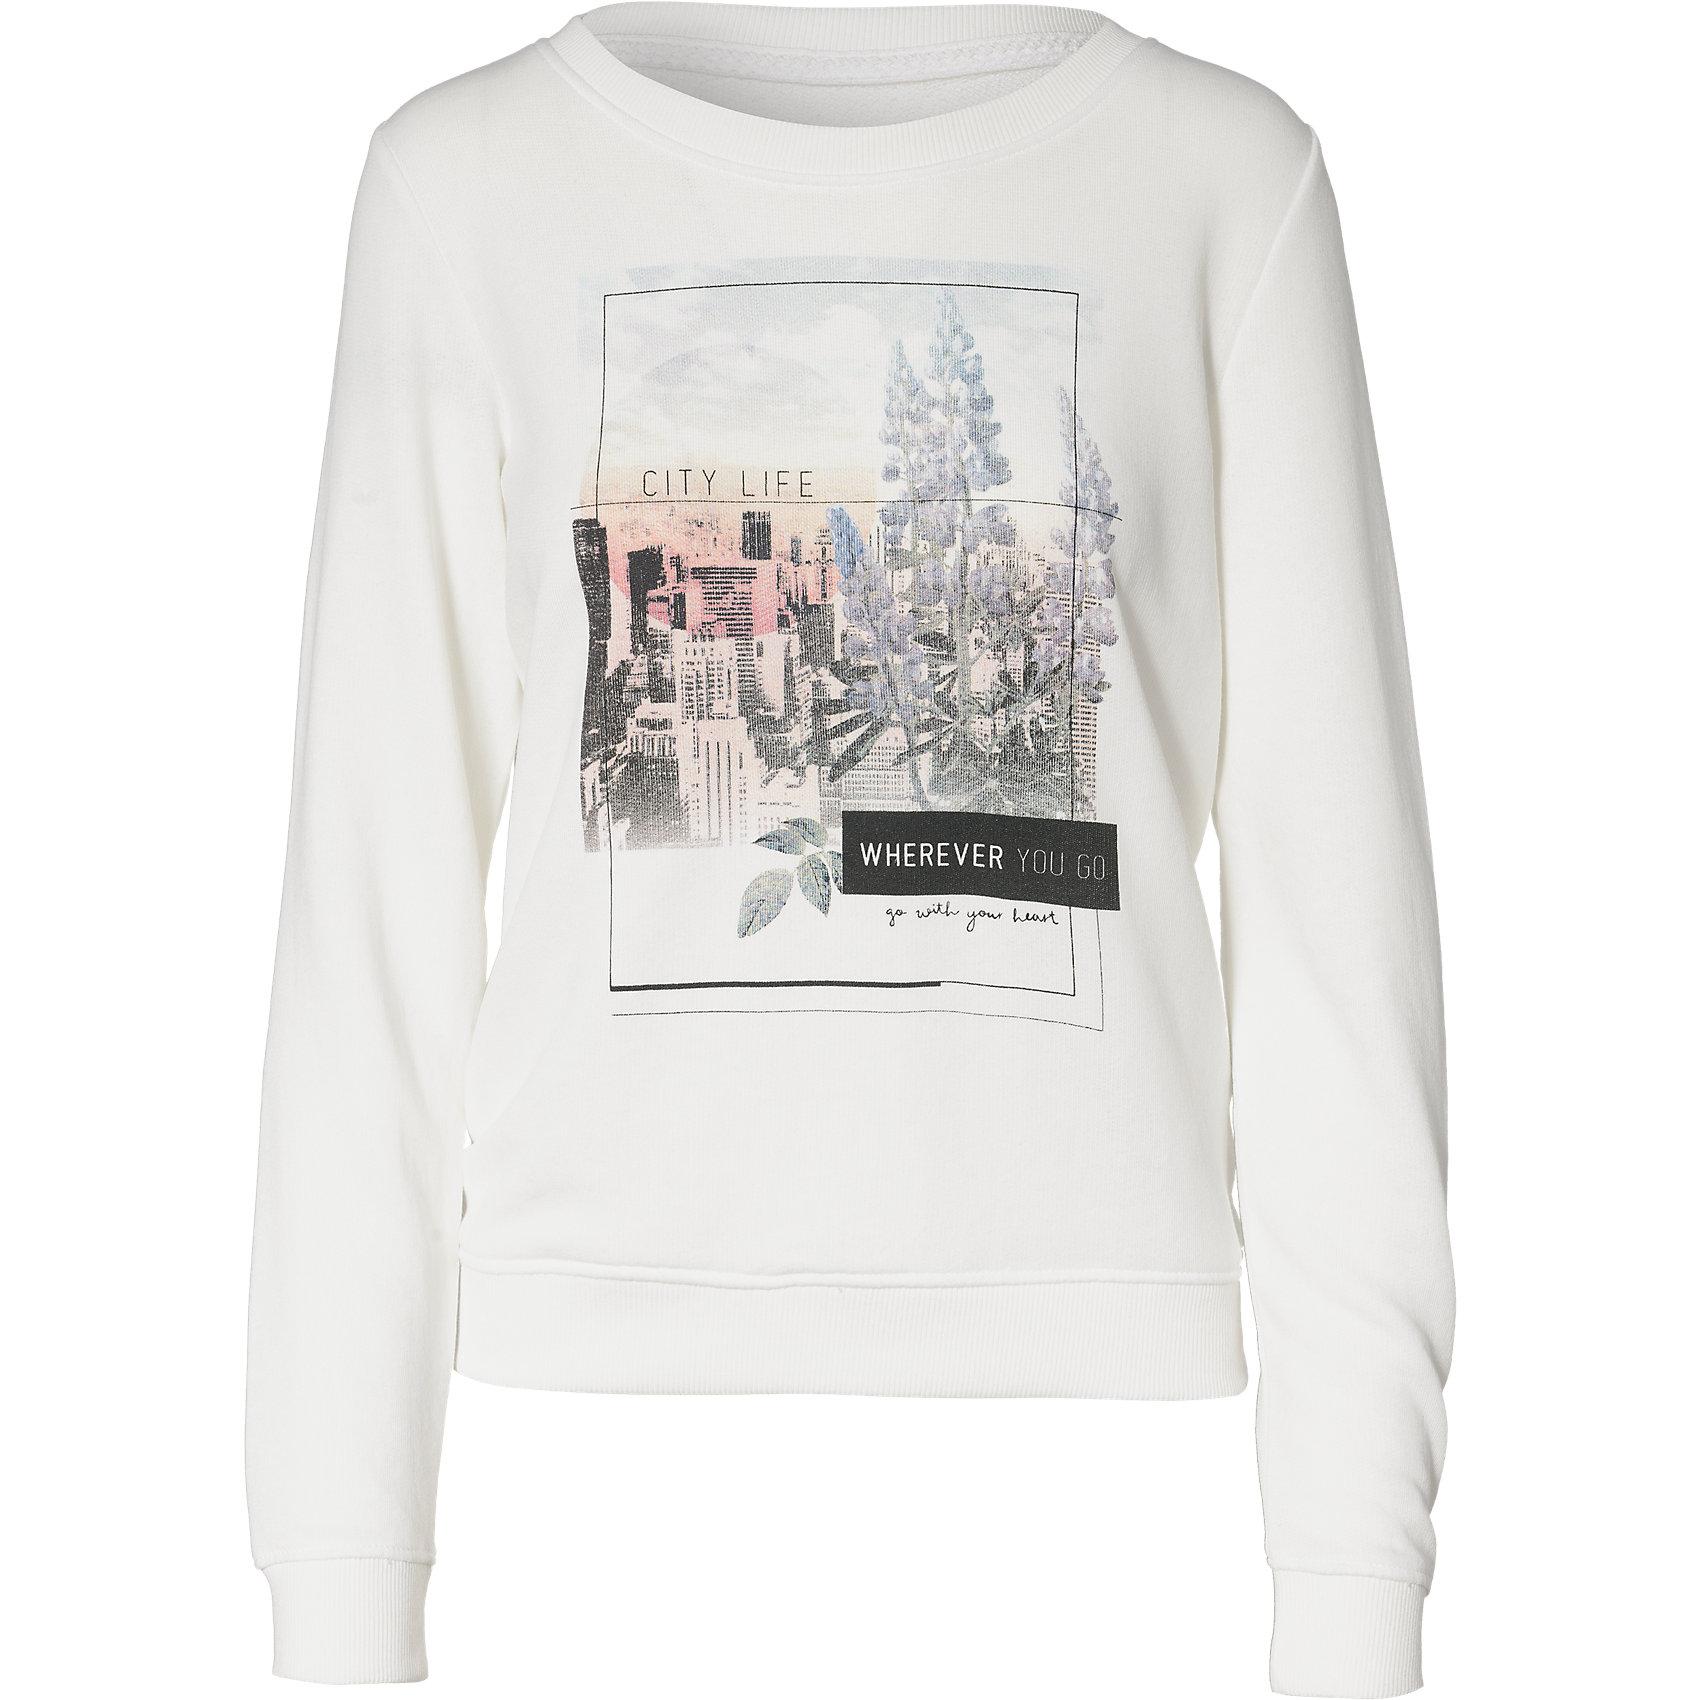 Neu-ONLY-Sweatshirt-offwhite-hellgrau-5643503